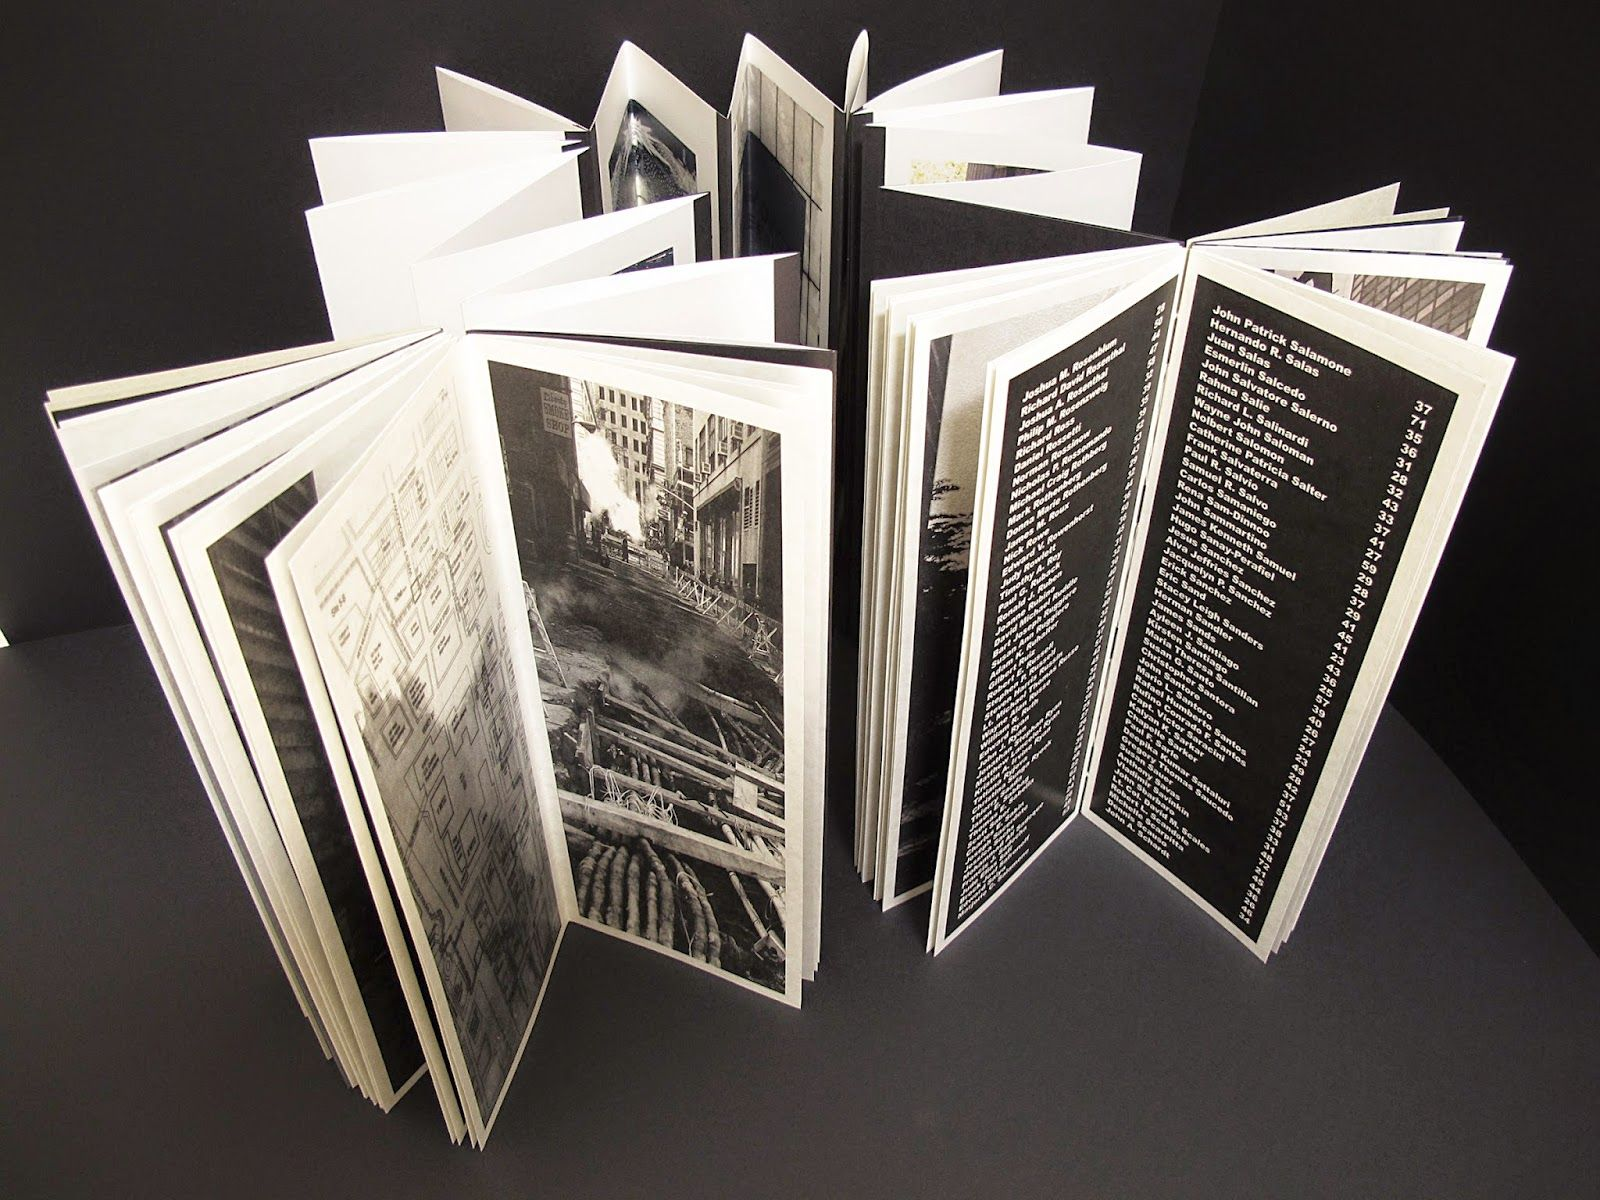 ARLIS/NA Book Art SIG blog post: Hecatombe 9-11: Artist's Book at the National 9-11 Memorial Museum